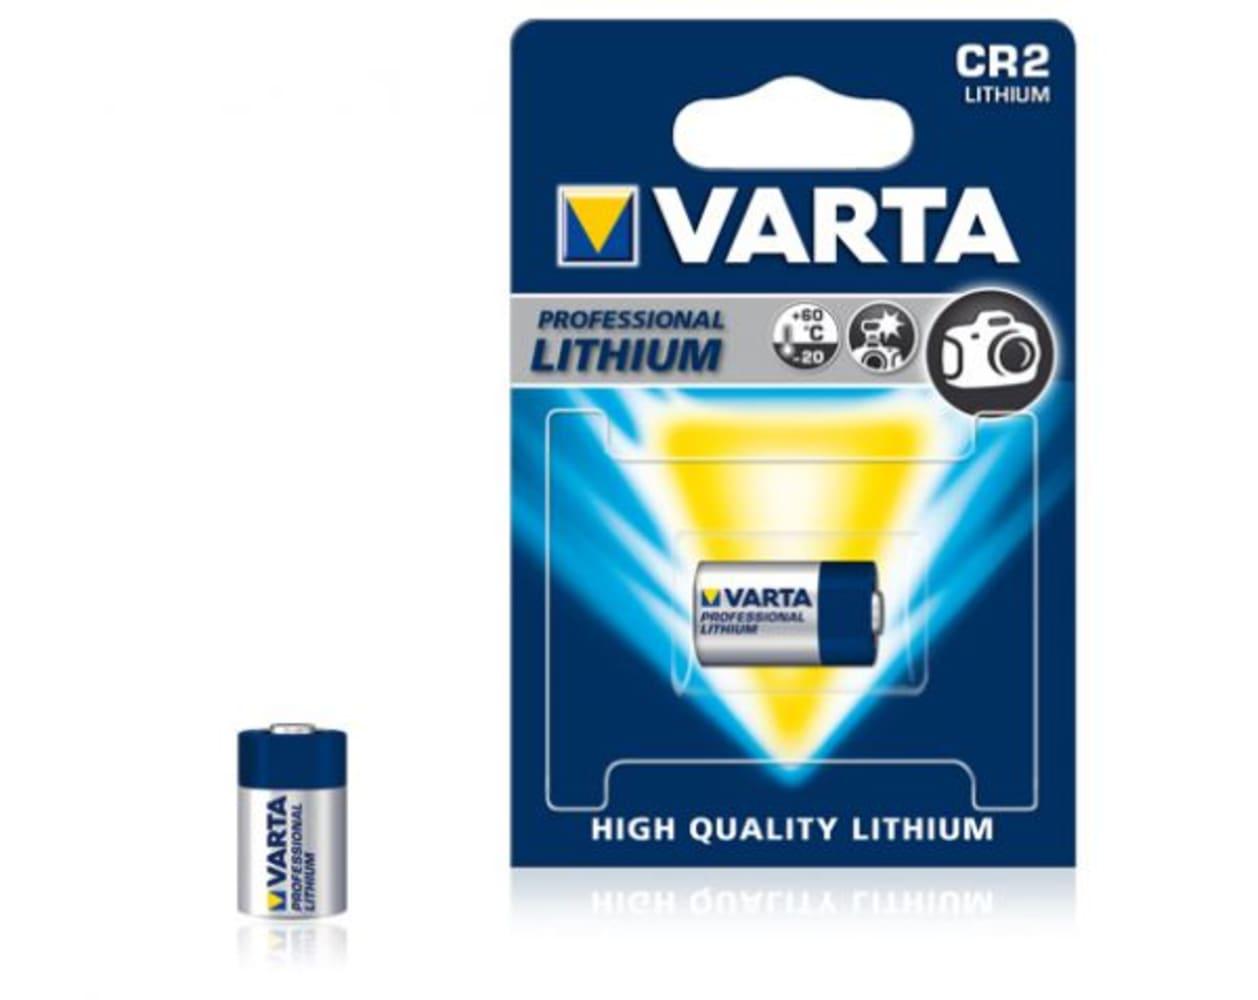 Batterie Varta Professional Lithium 6206 1x CR2 / CR15H270